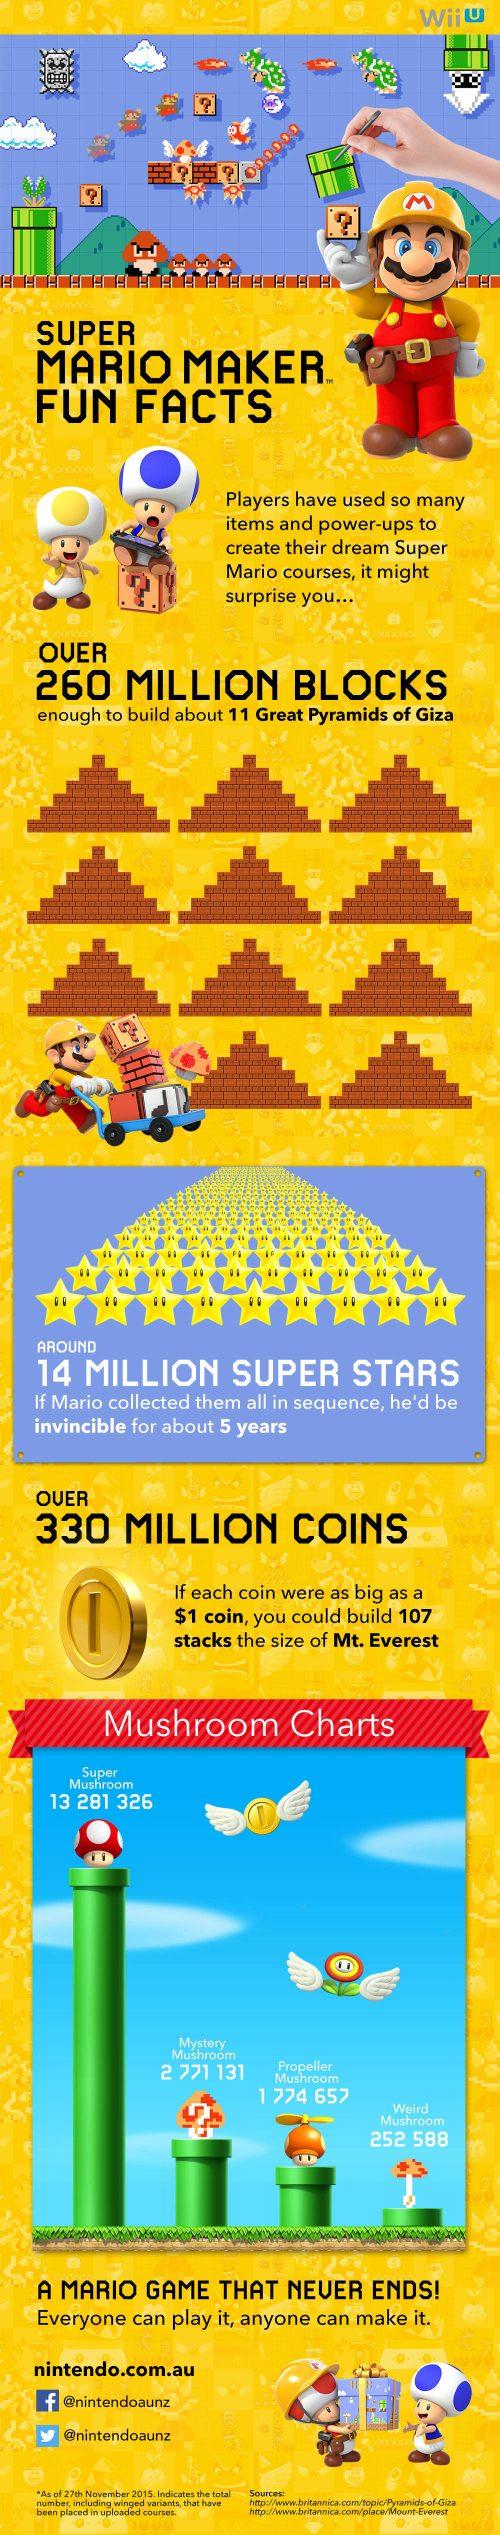 Nintendo Bringing Large Update to Super Mario Maker This Holiday